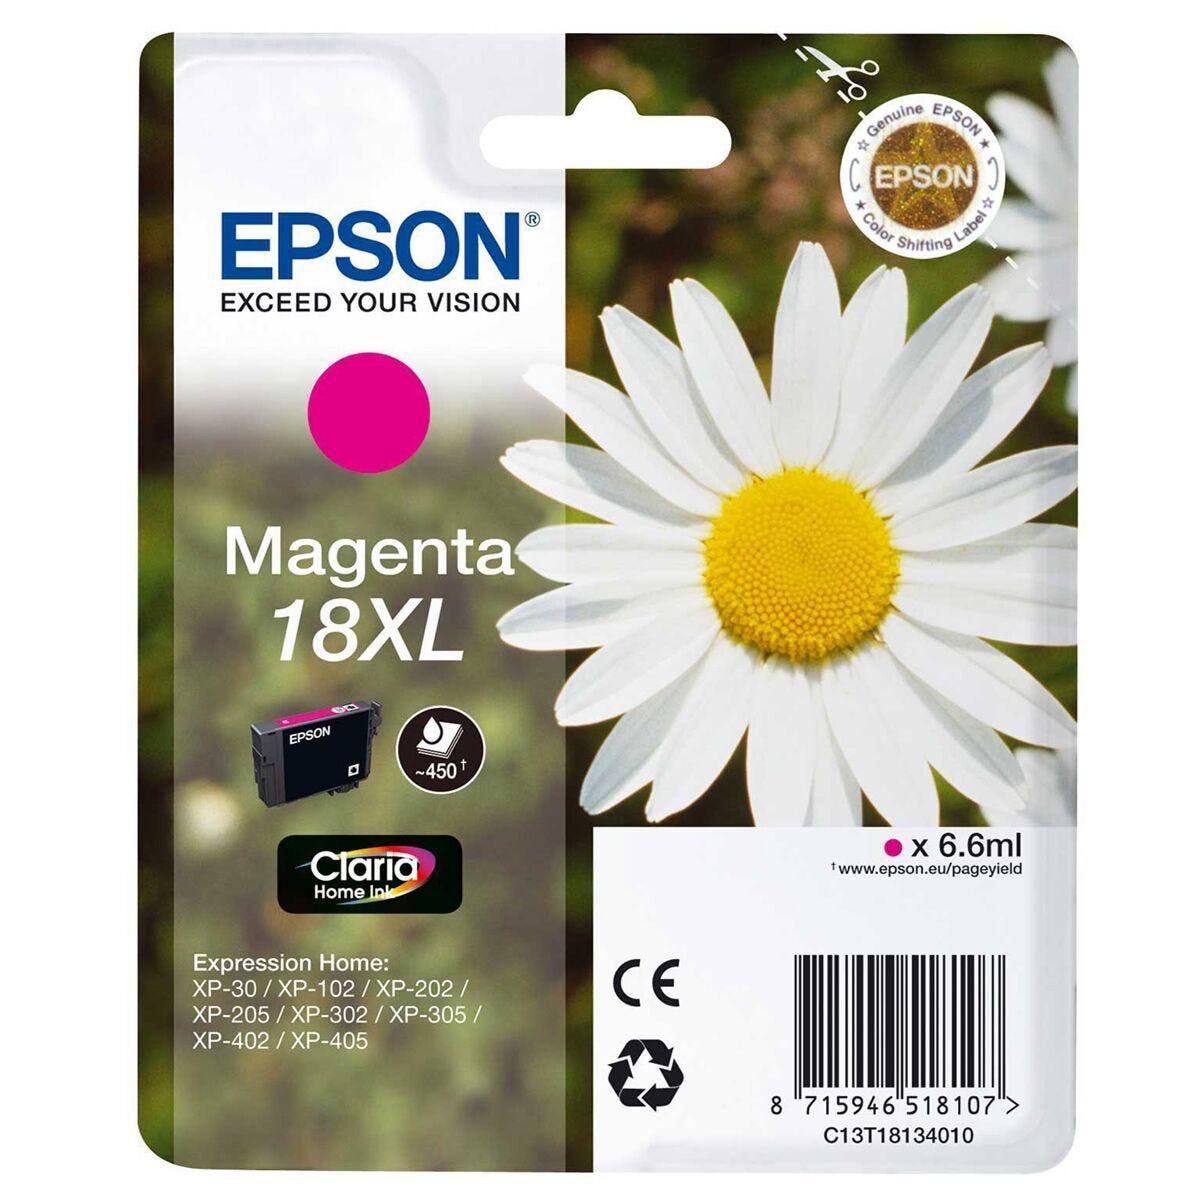 Epson Daisy XL Ink Cartridge C13T18134010